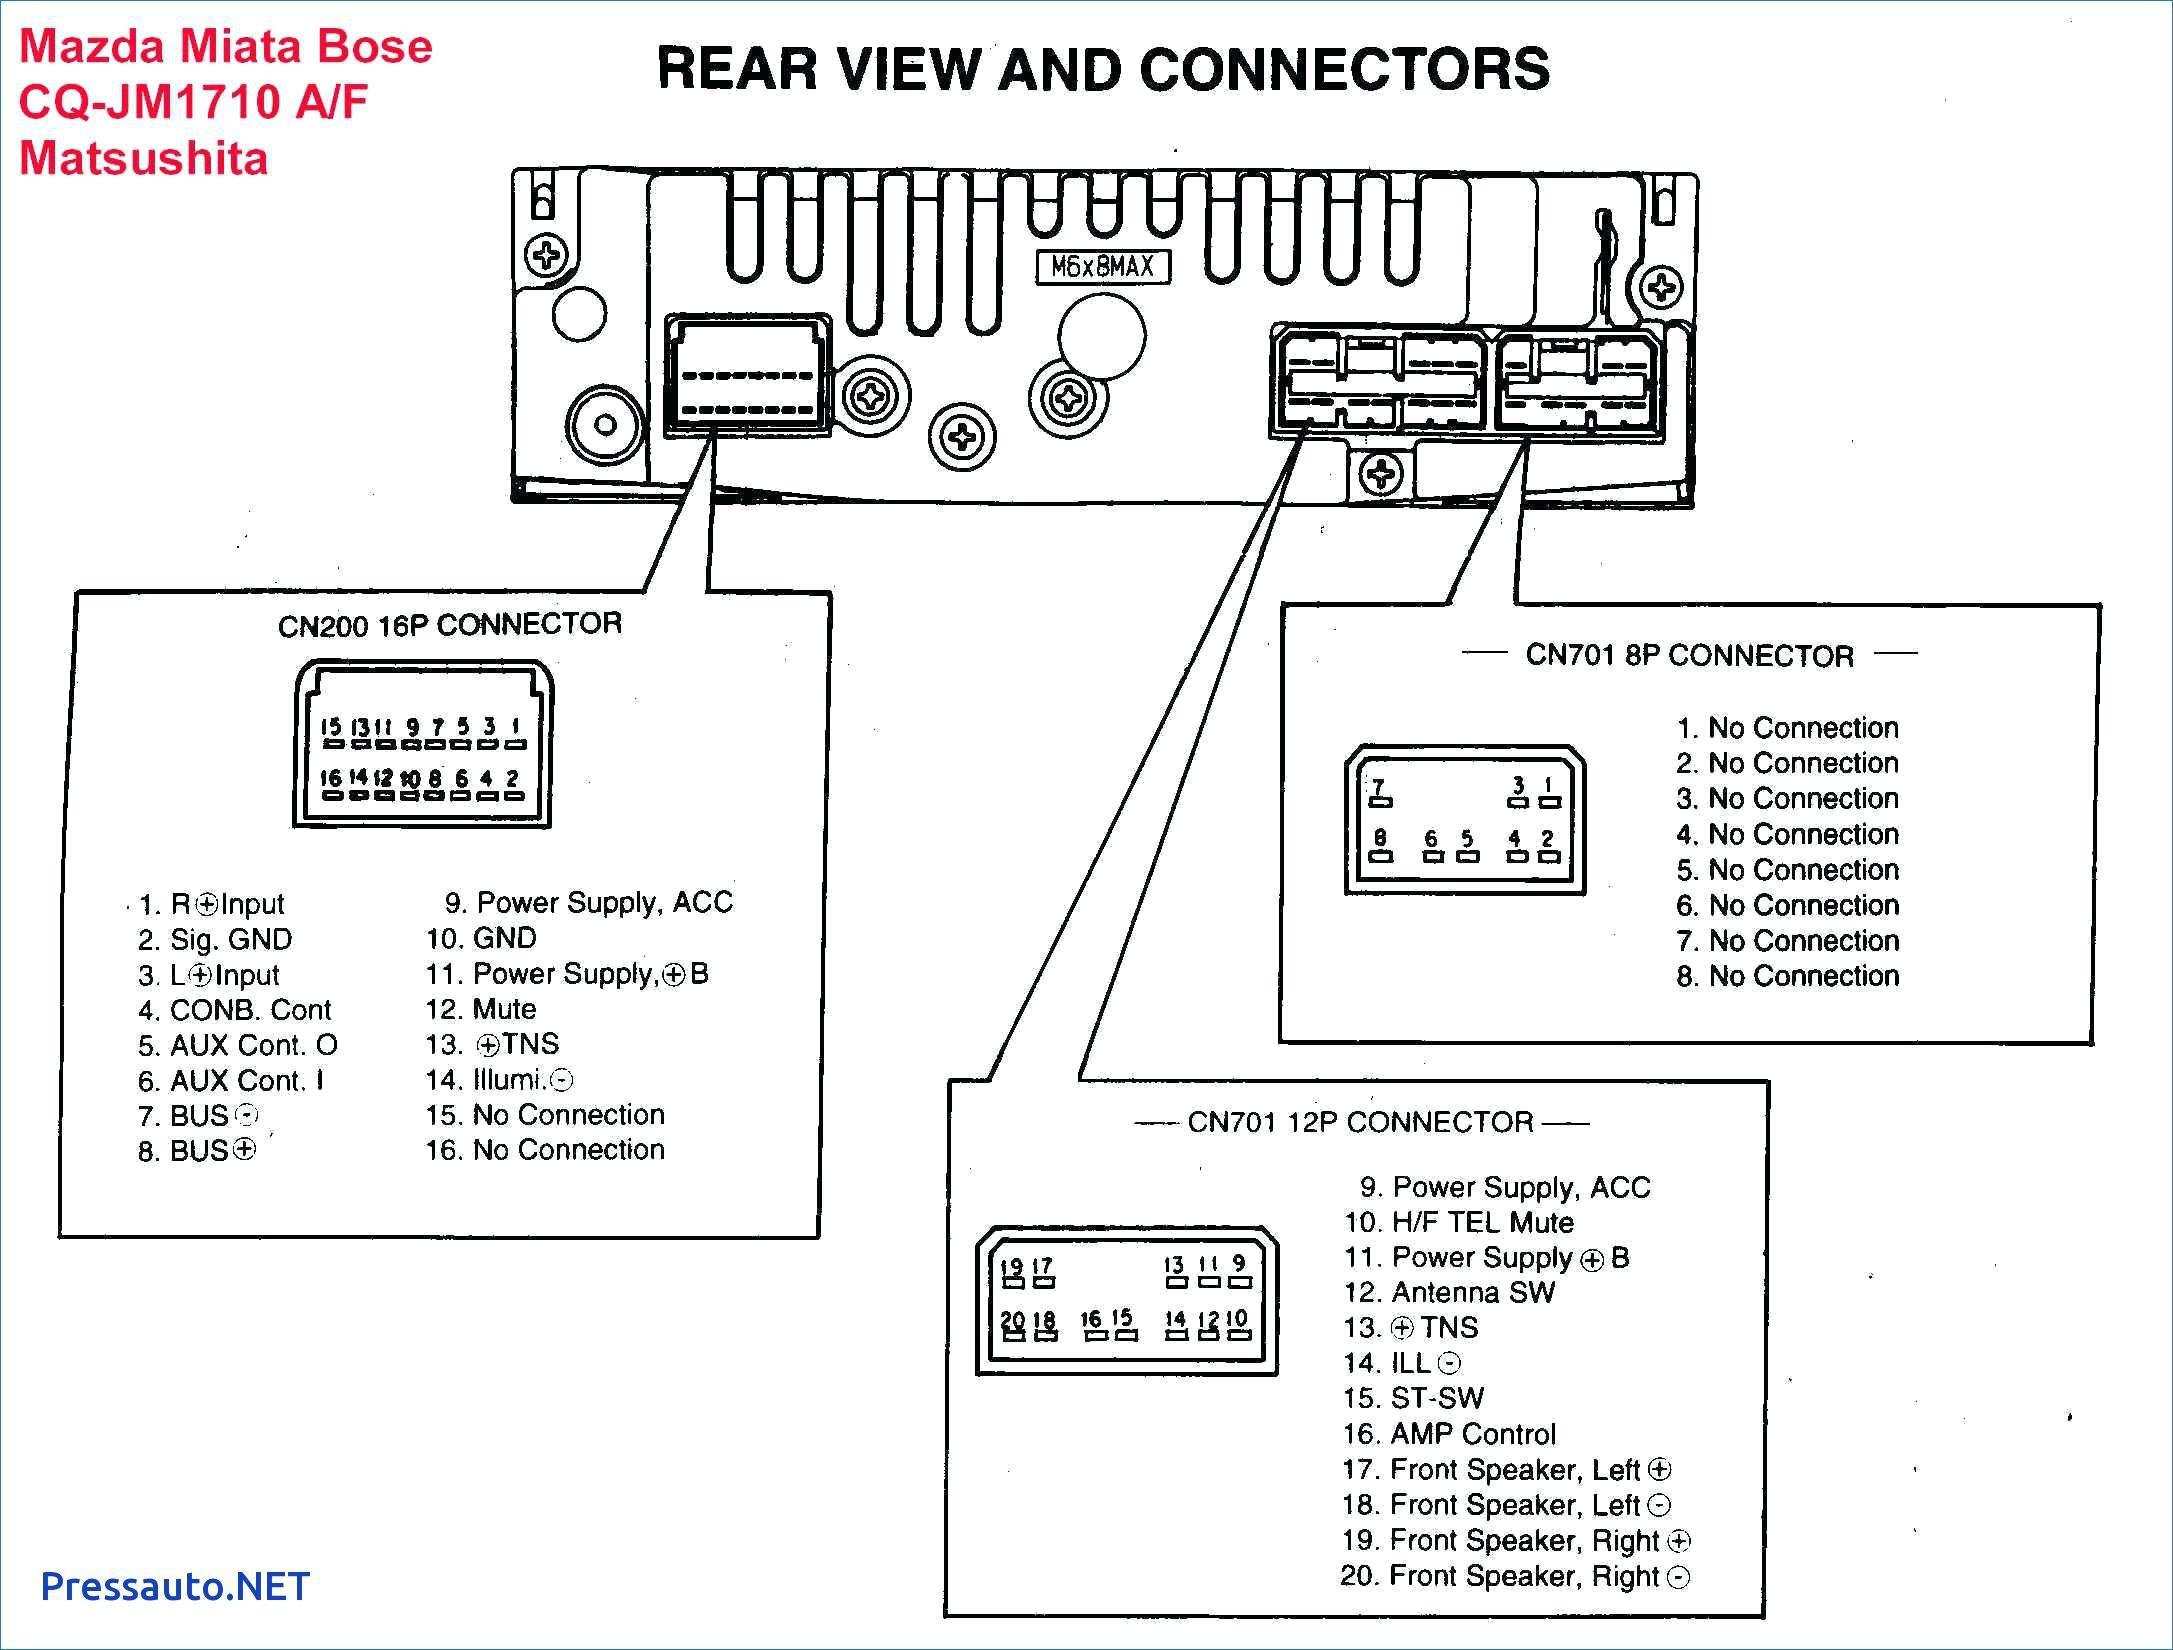 300zx Engine Harness Diagram Car Audio Wiring Diagram Unique Nissan Wiring Harness Diagram 1990 Of 300zx Engine Harness Diagram